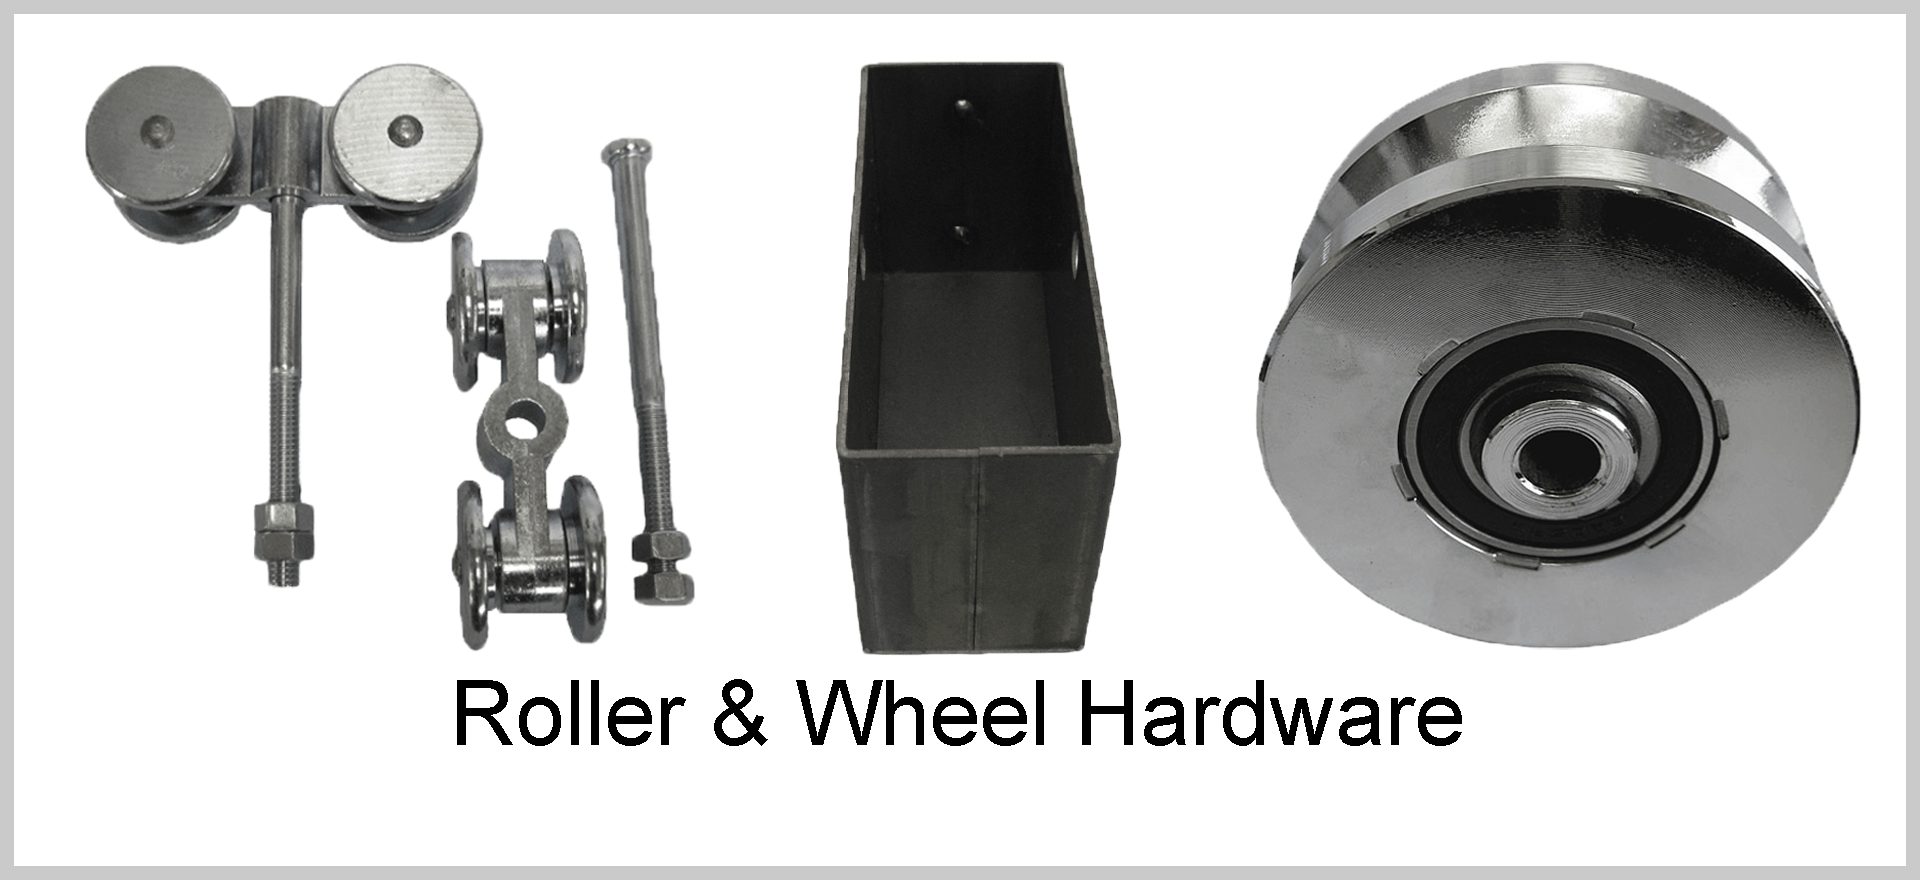 Roller & Wheels Hardware